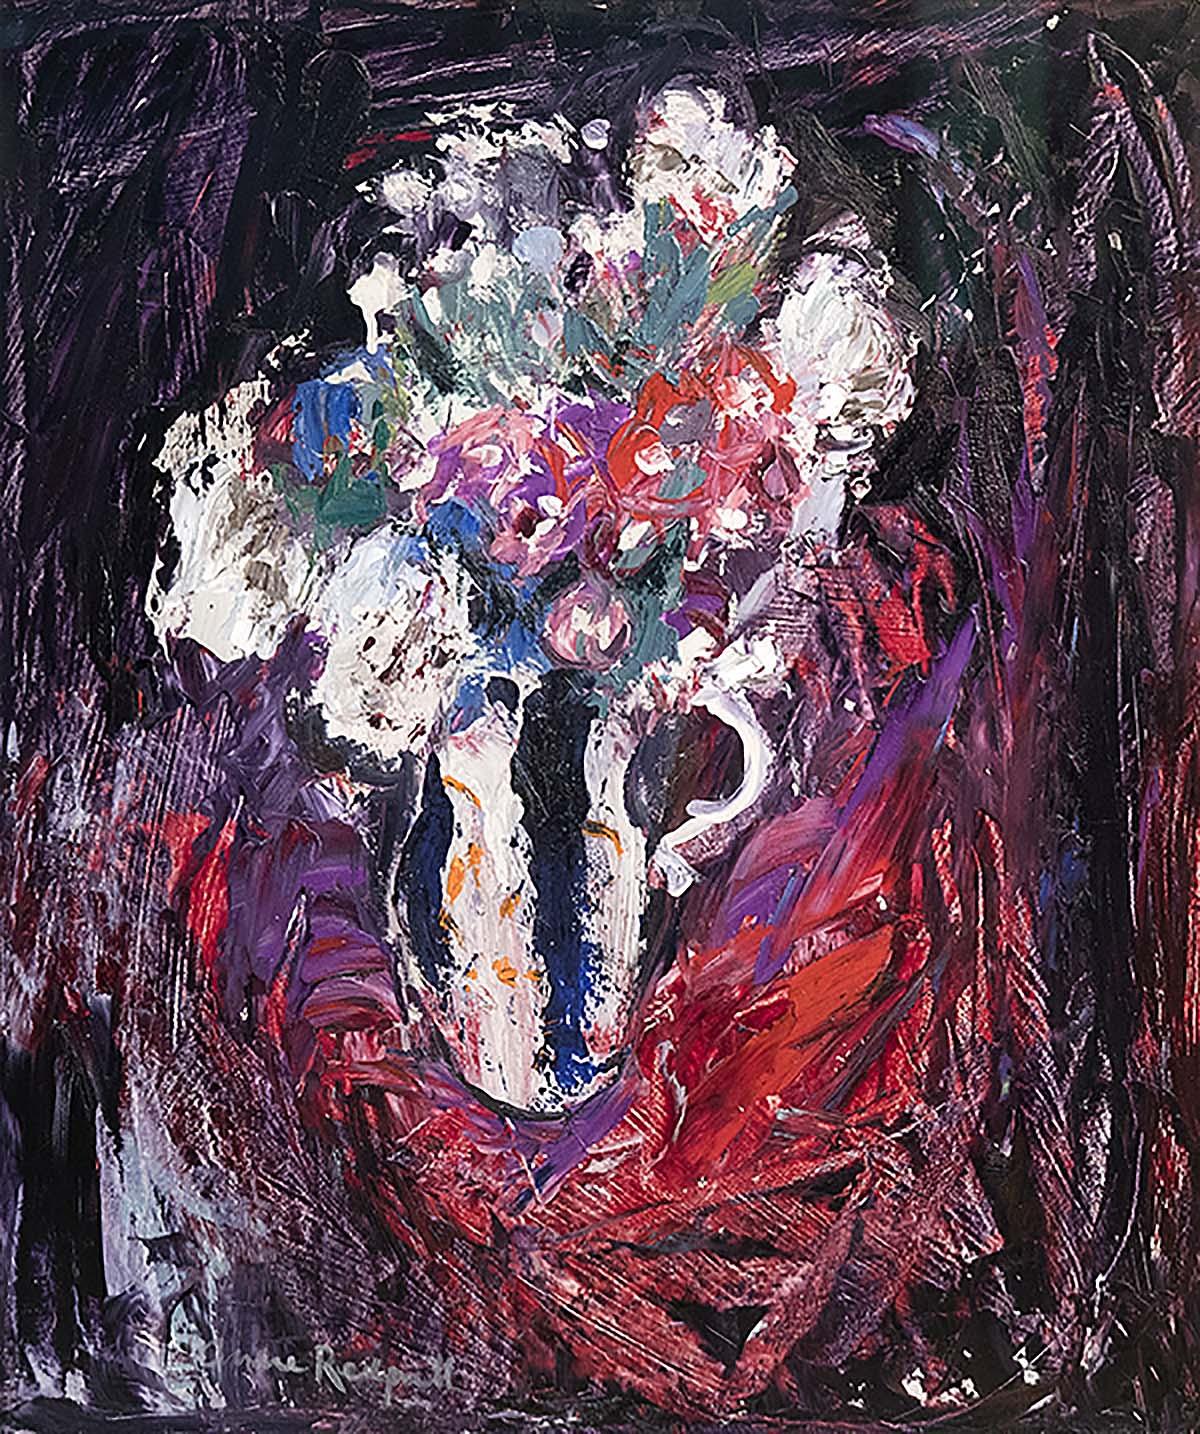 Anne Redpath, 'Flowers in a Jug', oil